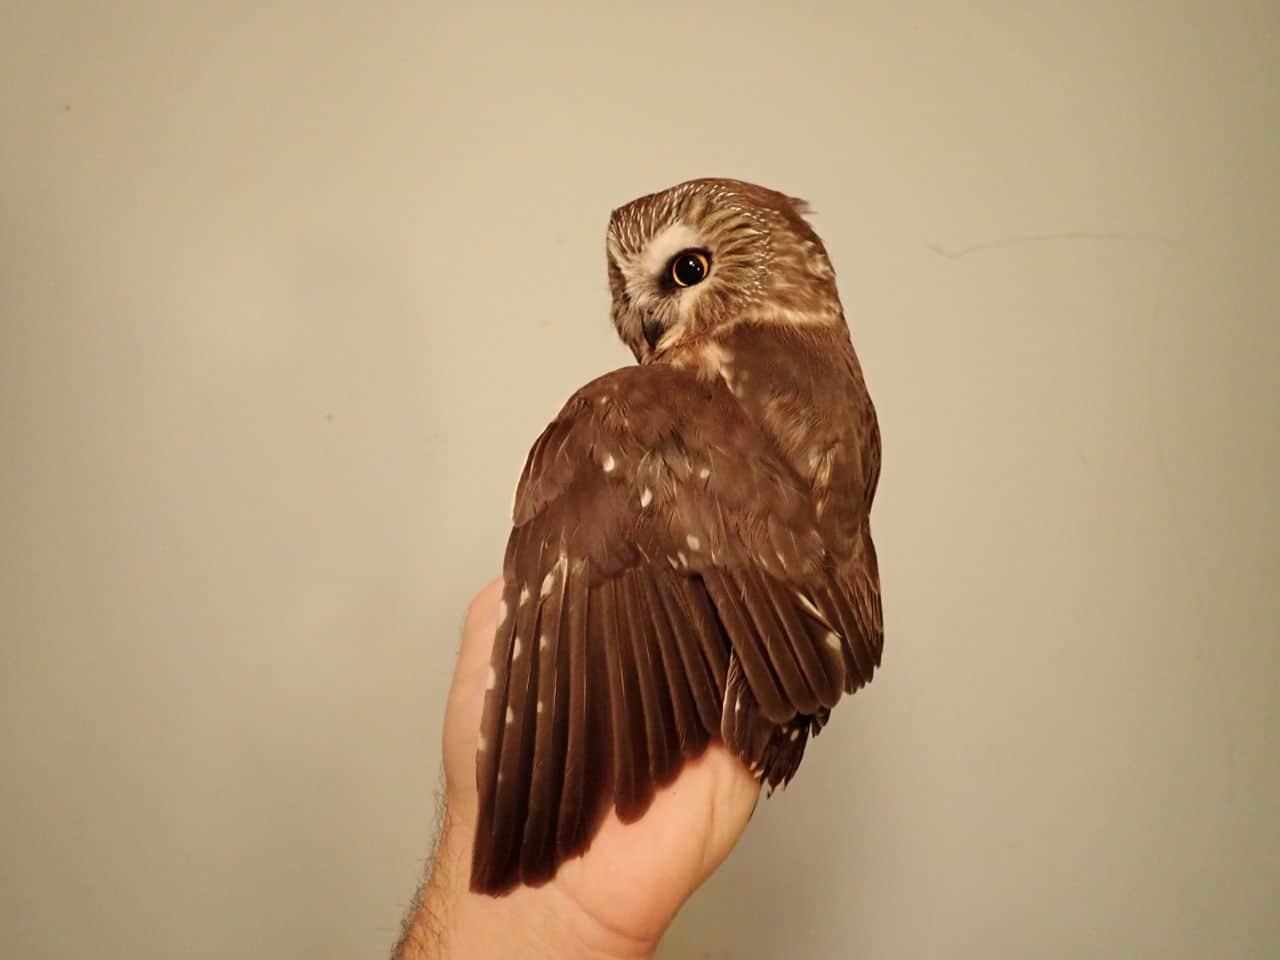 06 Nov 2020 - Northern Saw-whet Owl (female)